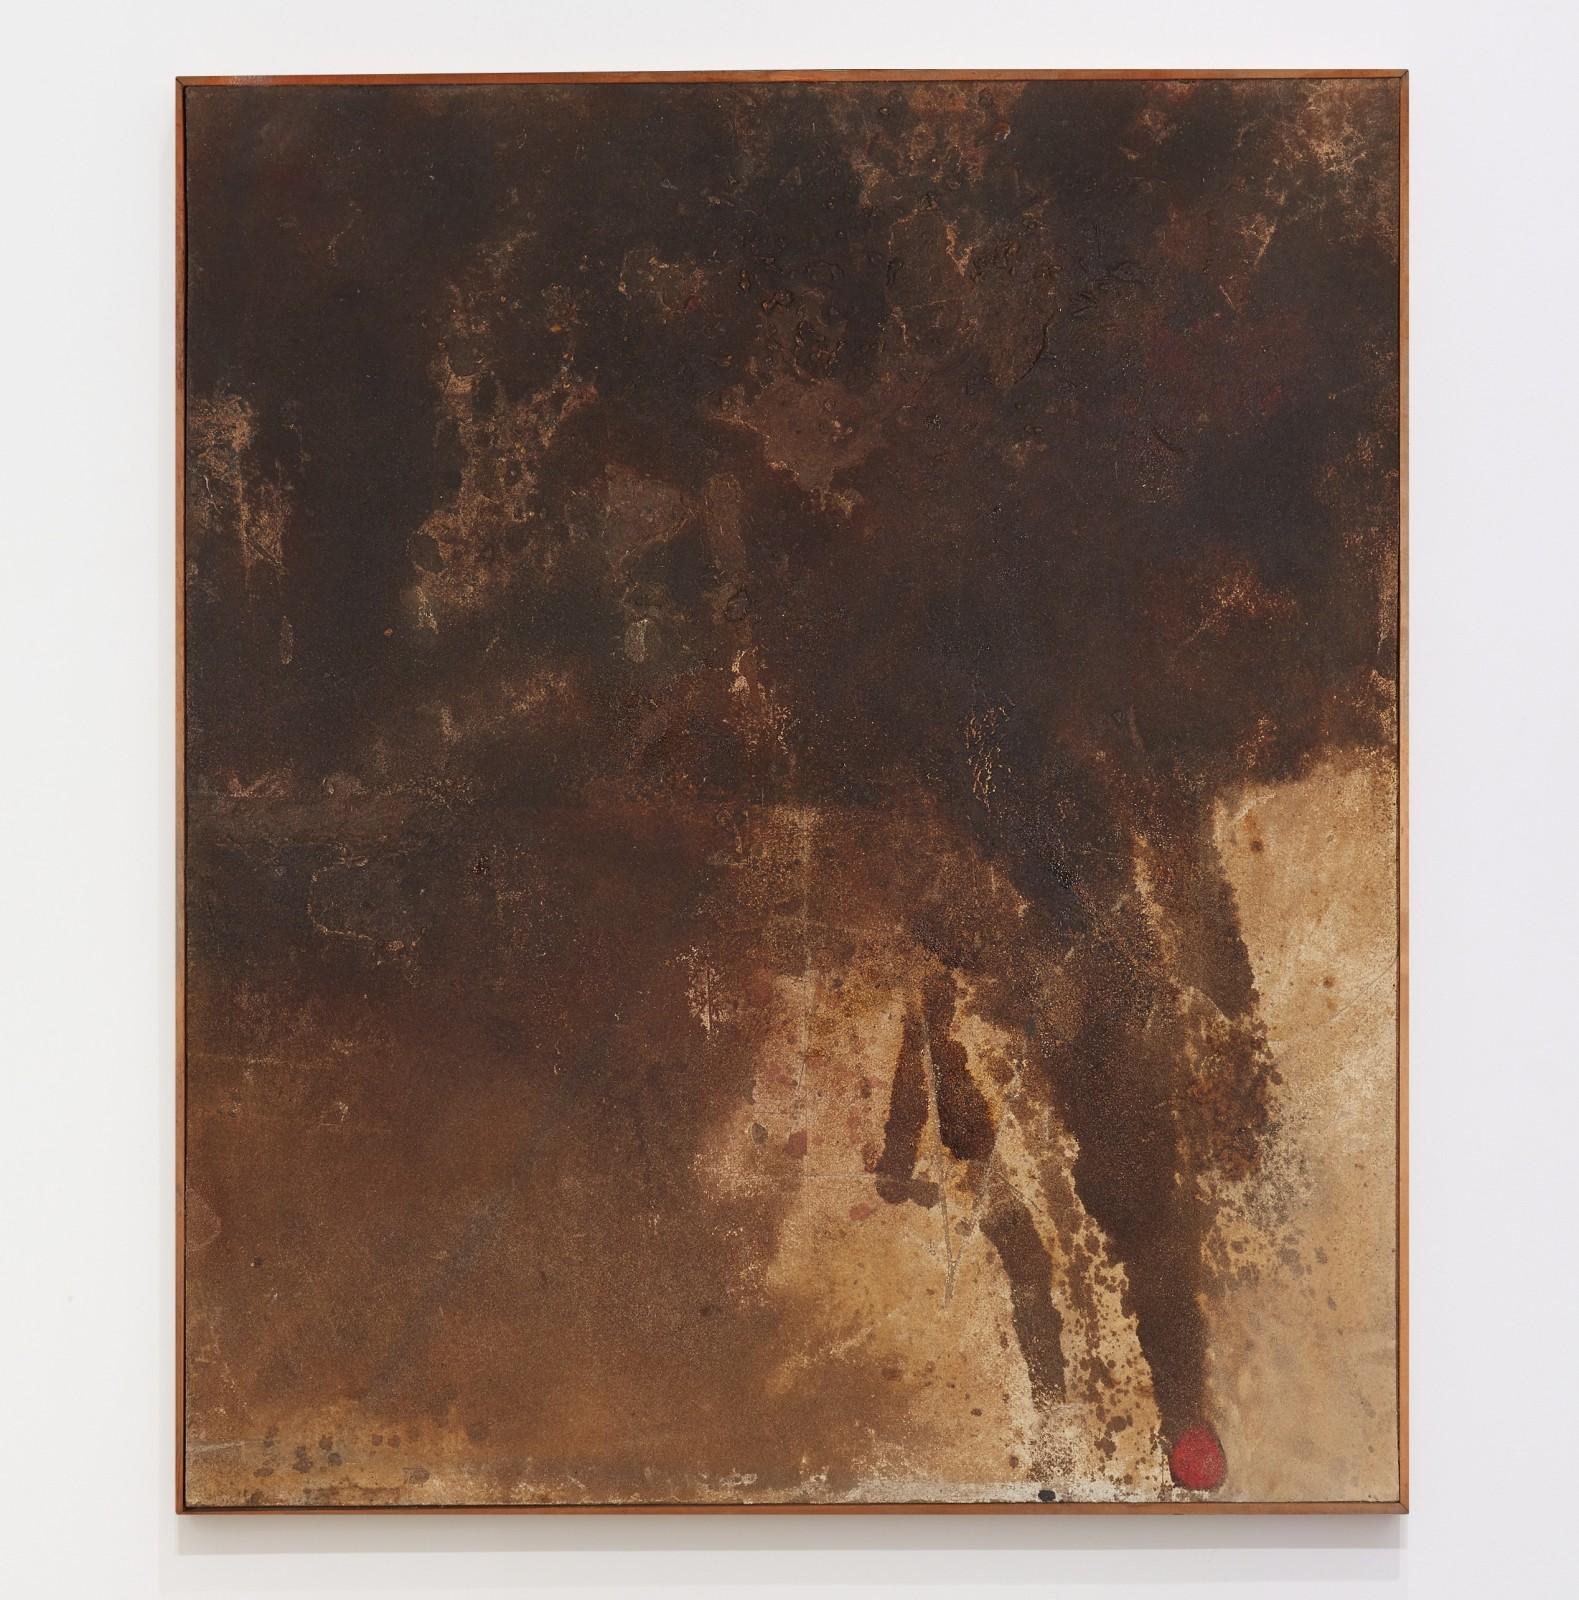 "<span class=""link fancybox-details-link""><a href=""/artists/157-robert-mallary/works/10142/"">View Detail Page</a></span><div class=""artist""><span class=""artist""><strong>ROBERT MALLARY</strong></span></div><div class=""title""><em>The Warrior</em>, 1957 - 1958</div><div class=""medium"">Mixed media</div><div class=""dimensions"">123.8 x 106 x 5.7 cm<br /> 48 ¾ x 41 ¾ x 2 ¼ in</div>"